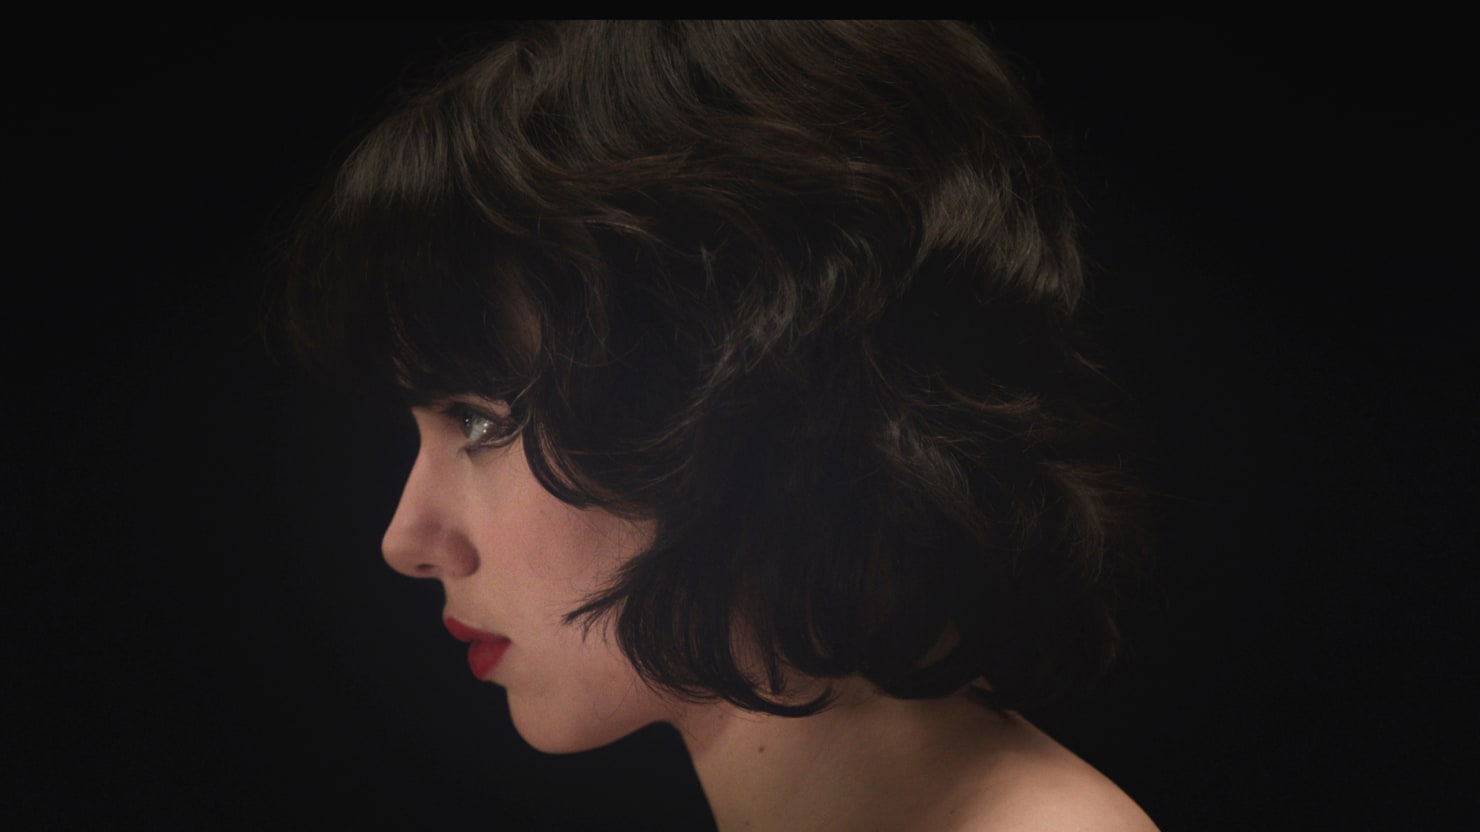 Scarlett Johansson is an Alien Seductress in 'Under the Skin'